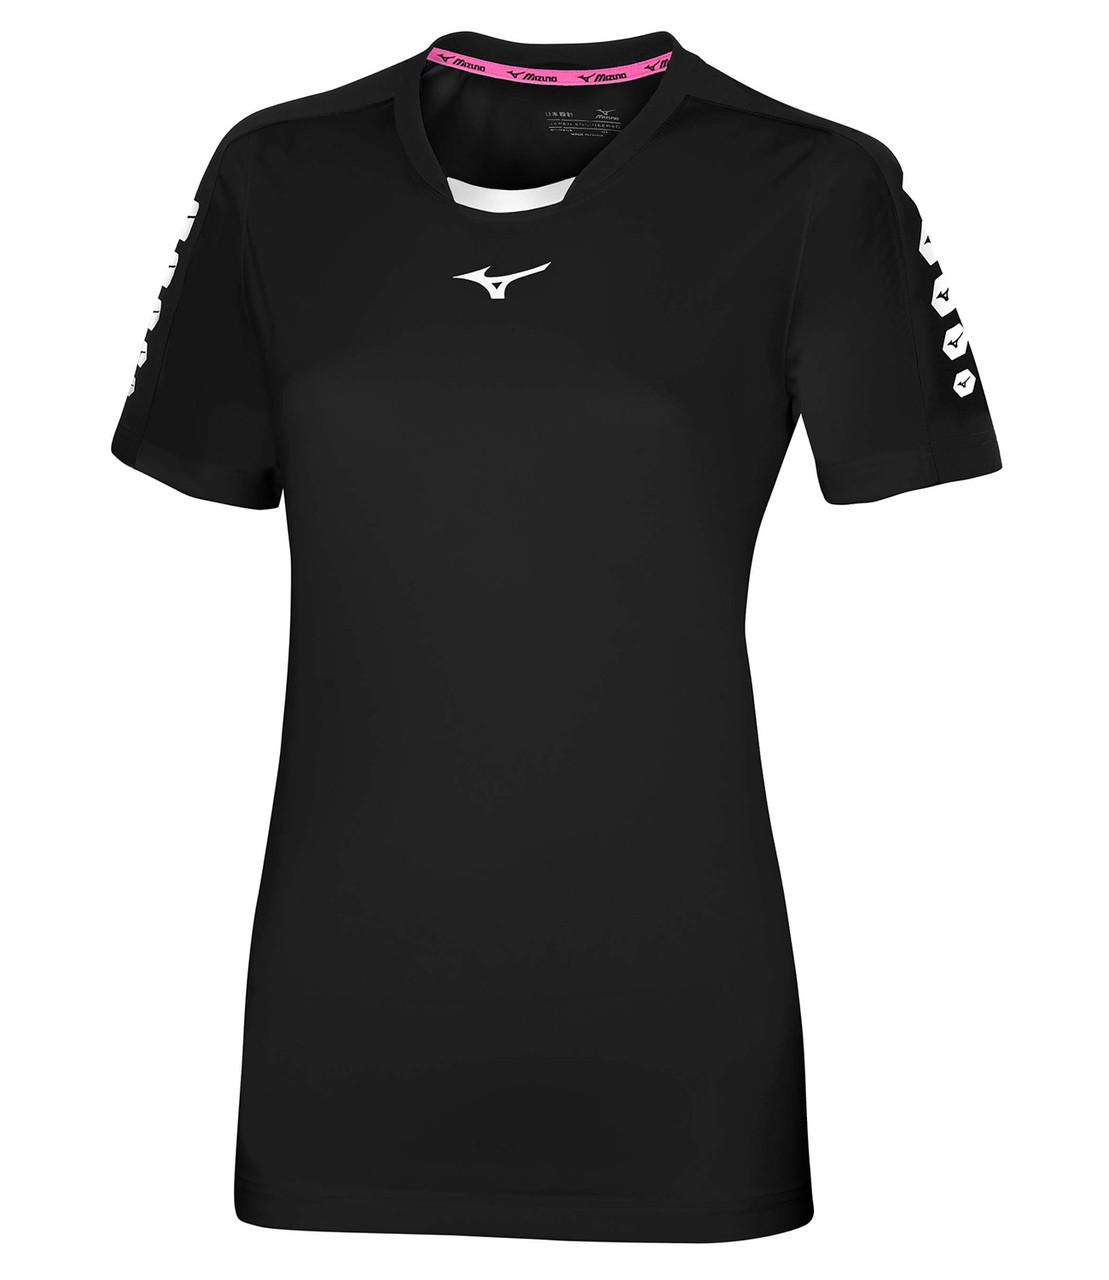 Футболка Mizuno Soukyu Shirt (W) (X2EA7700-09)